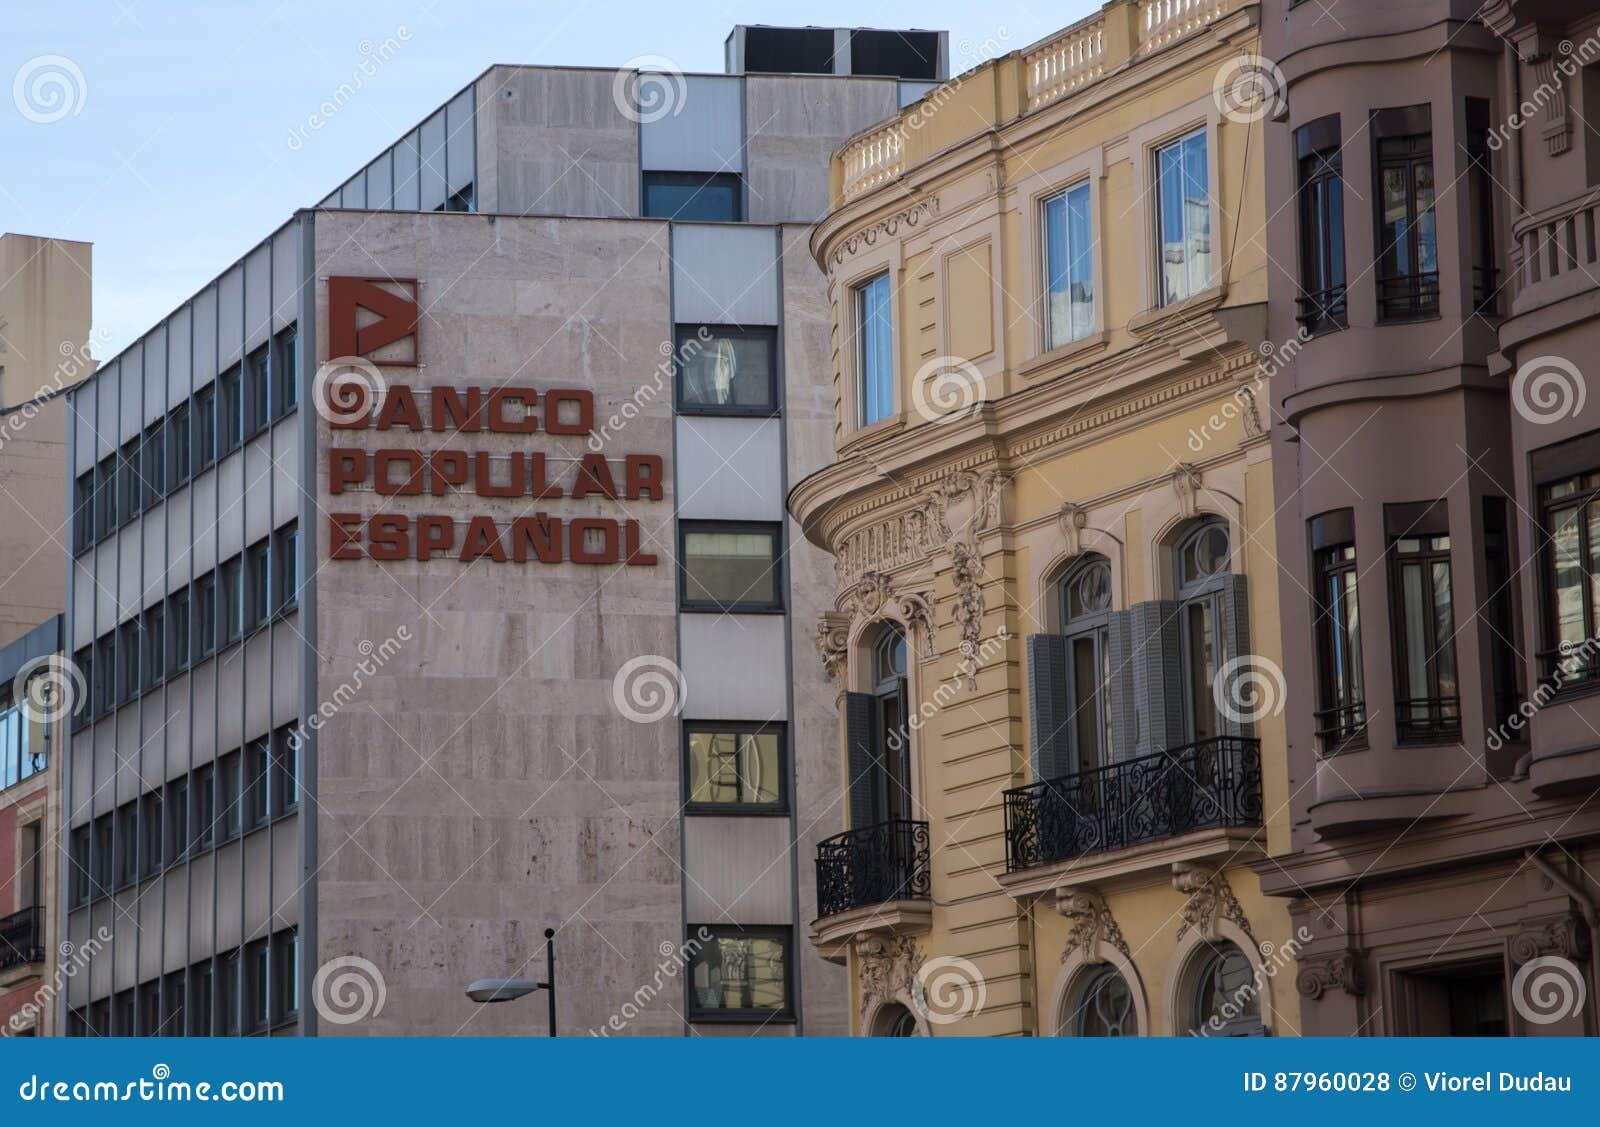 Banco Popular Espanol